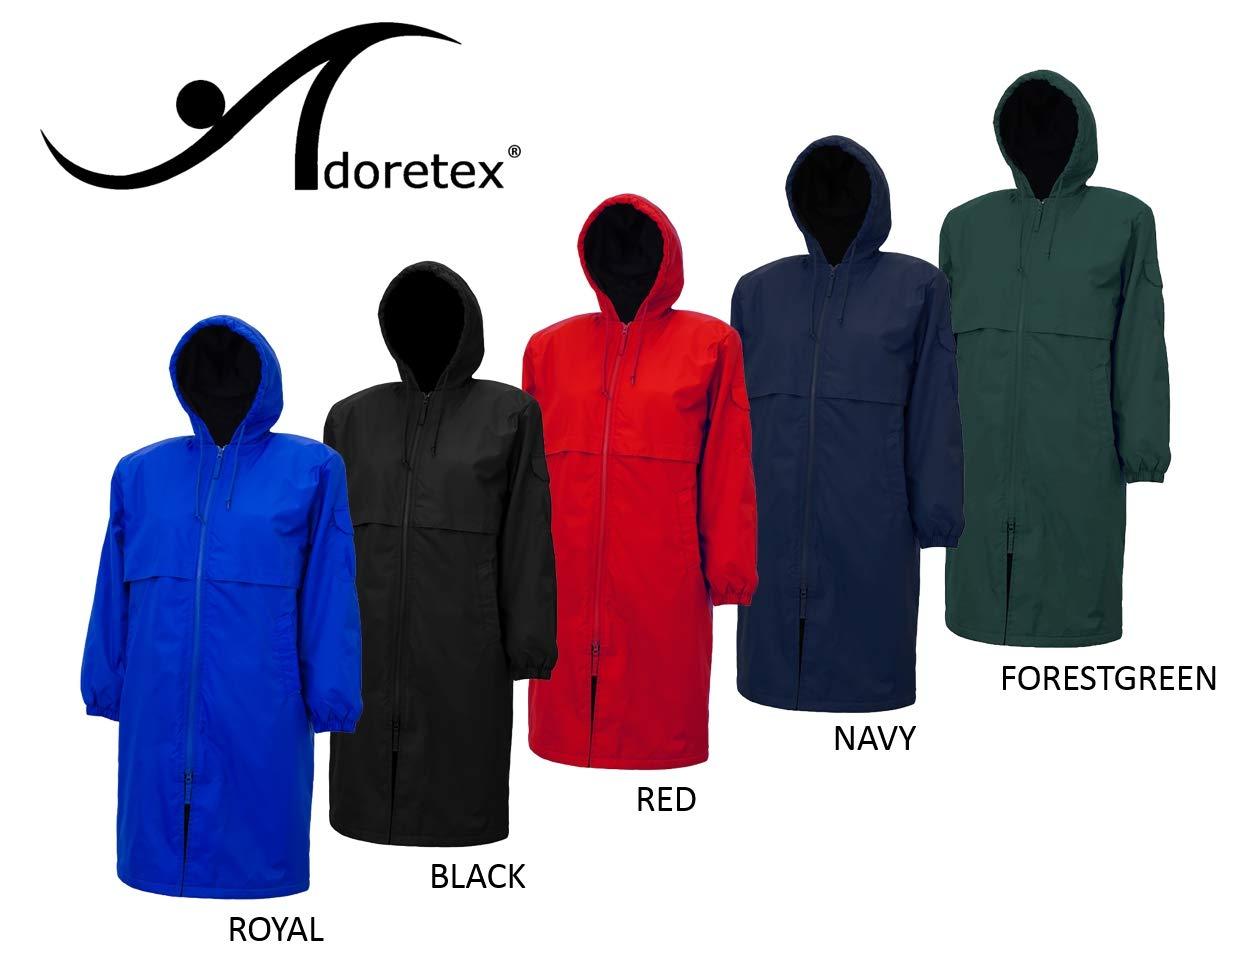 Adoretex Unisex Swim Parka Water Resistant Warm Coat Water Sports Swim Parka for Adults & Kids (PK006) - Navy - Youth - M